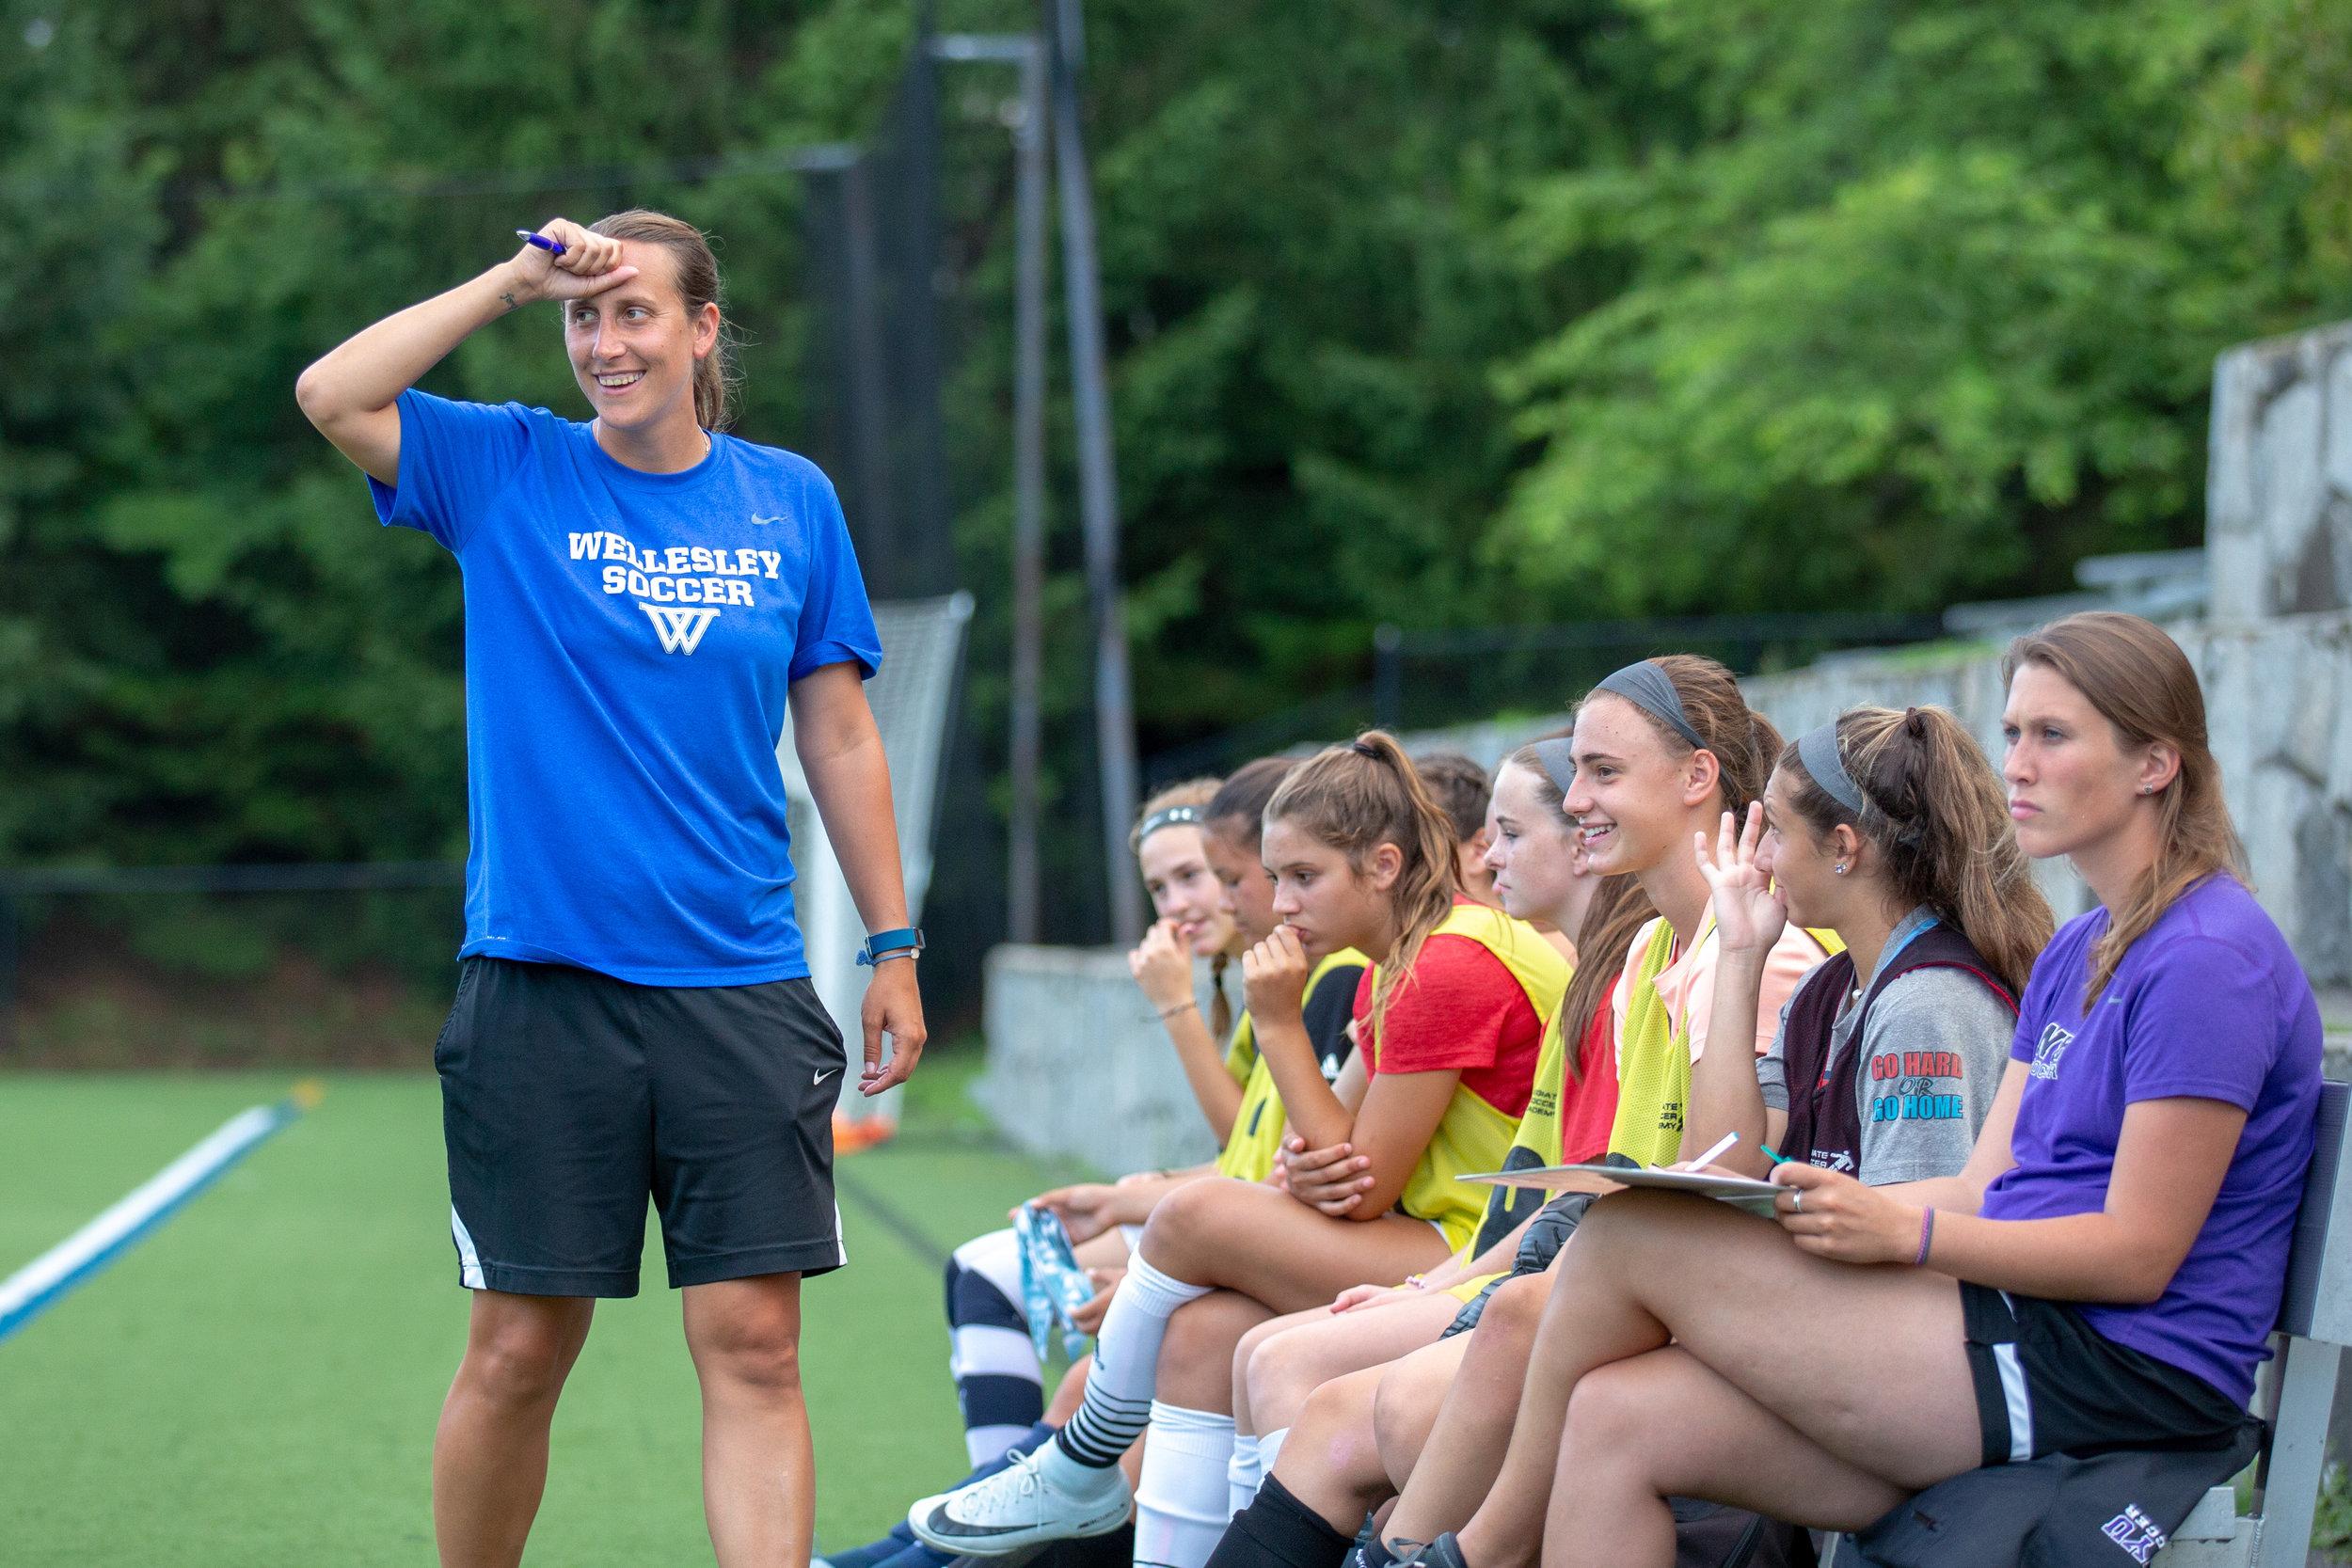 Wellesley College NYU Soccer camp summer New England